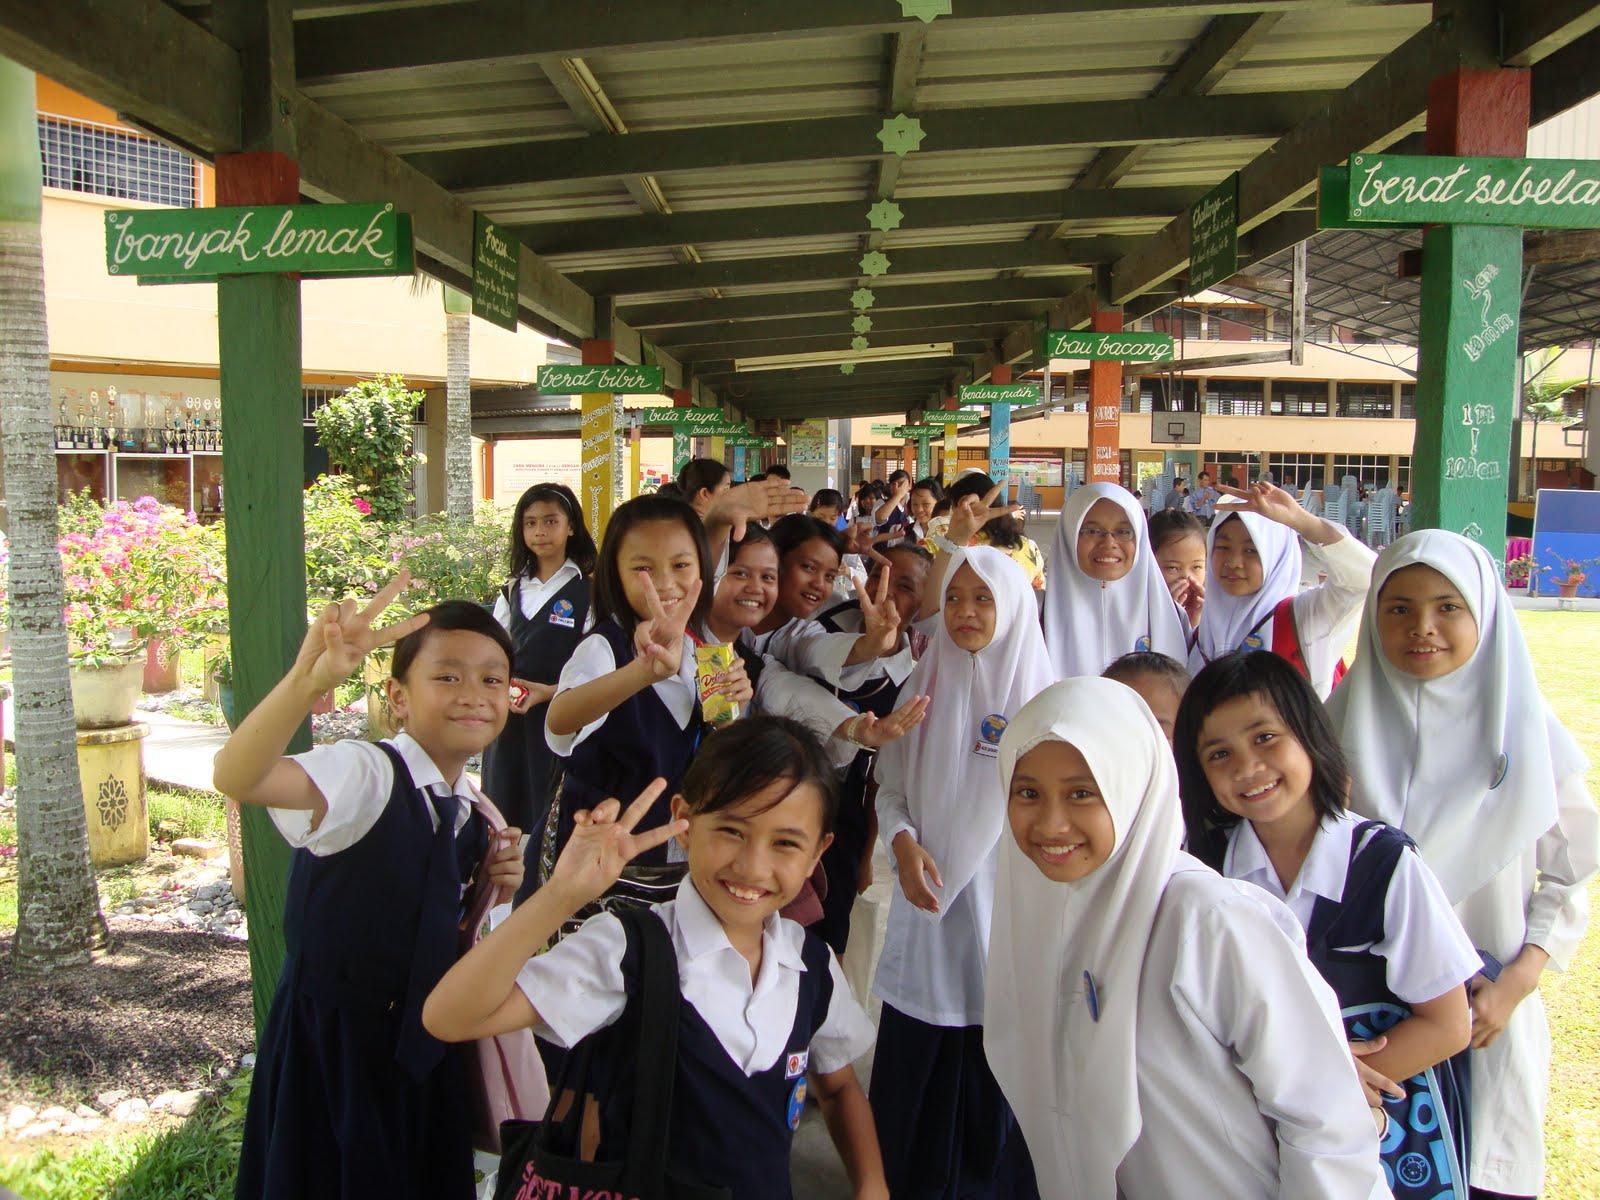 apdm sekolah malaysia kpm apdm which is apdm sekolah malaysia kpm